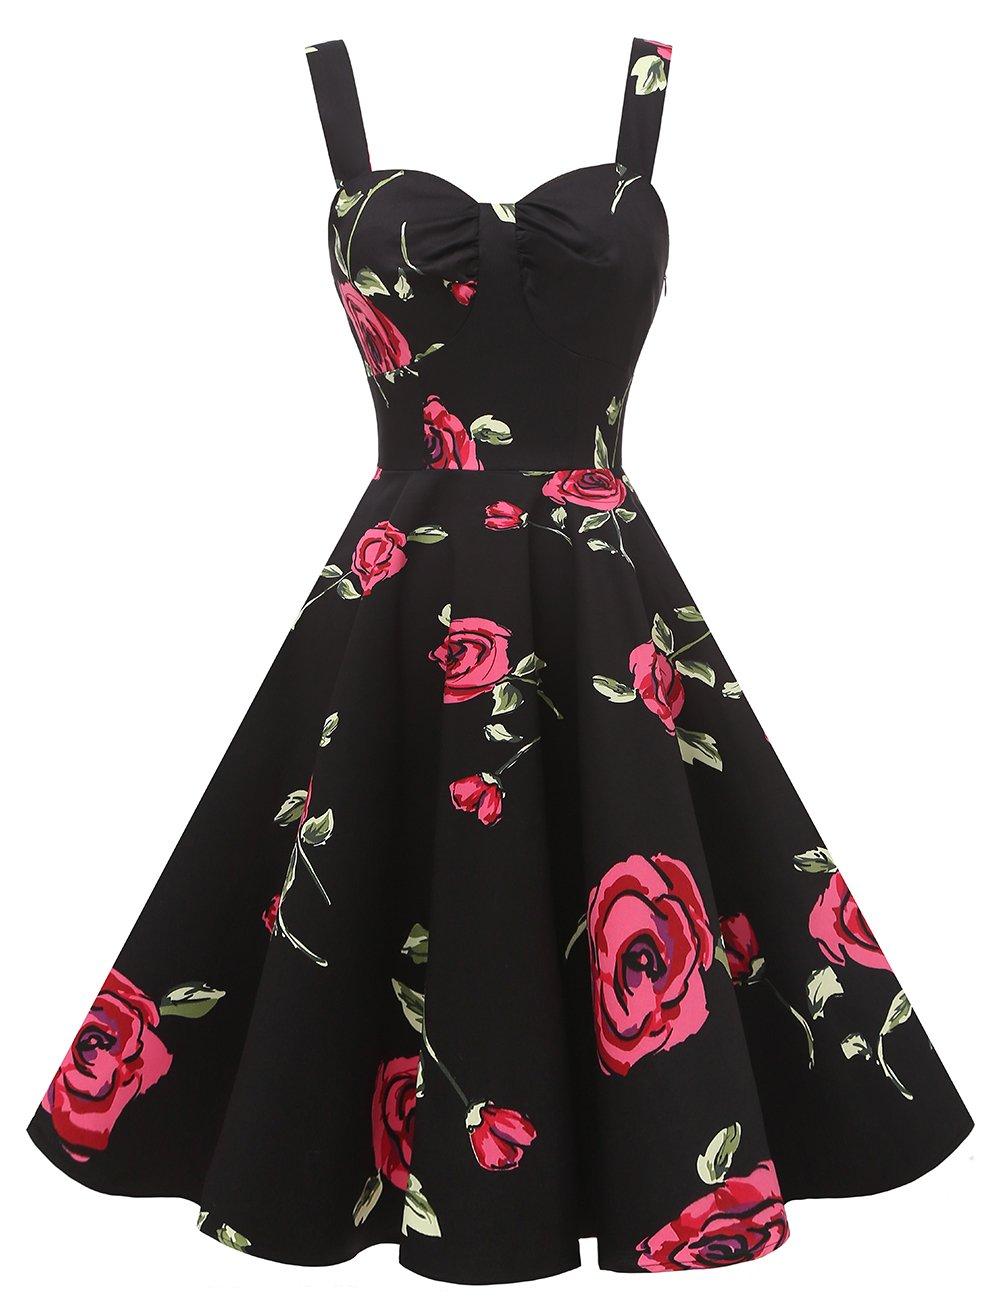 DRESSTELLS 1950s Retro Audrey Swing Pinup Rockabilly Dress Pleated Vintage Dress RedFlower L